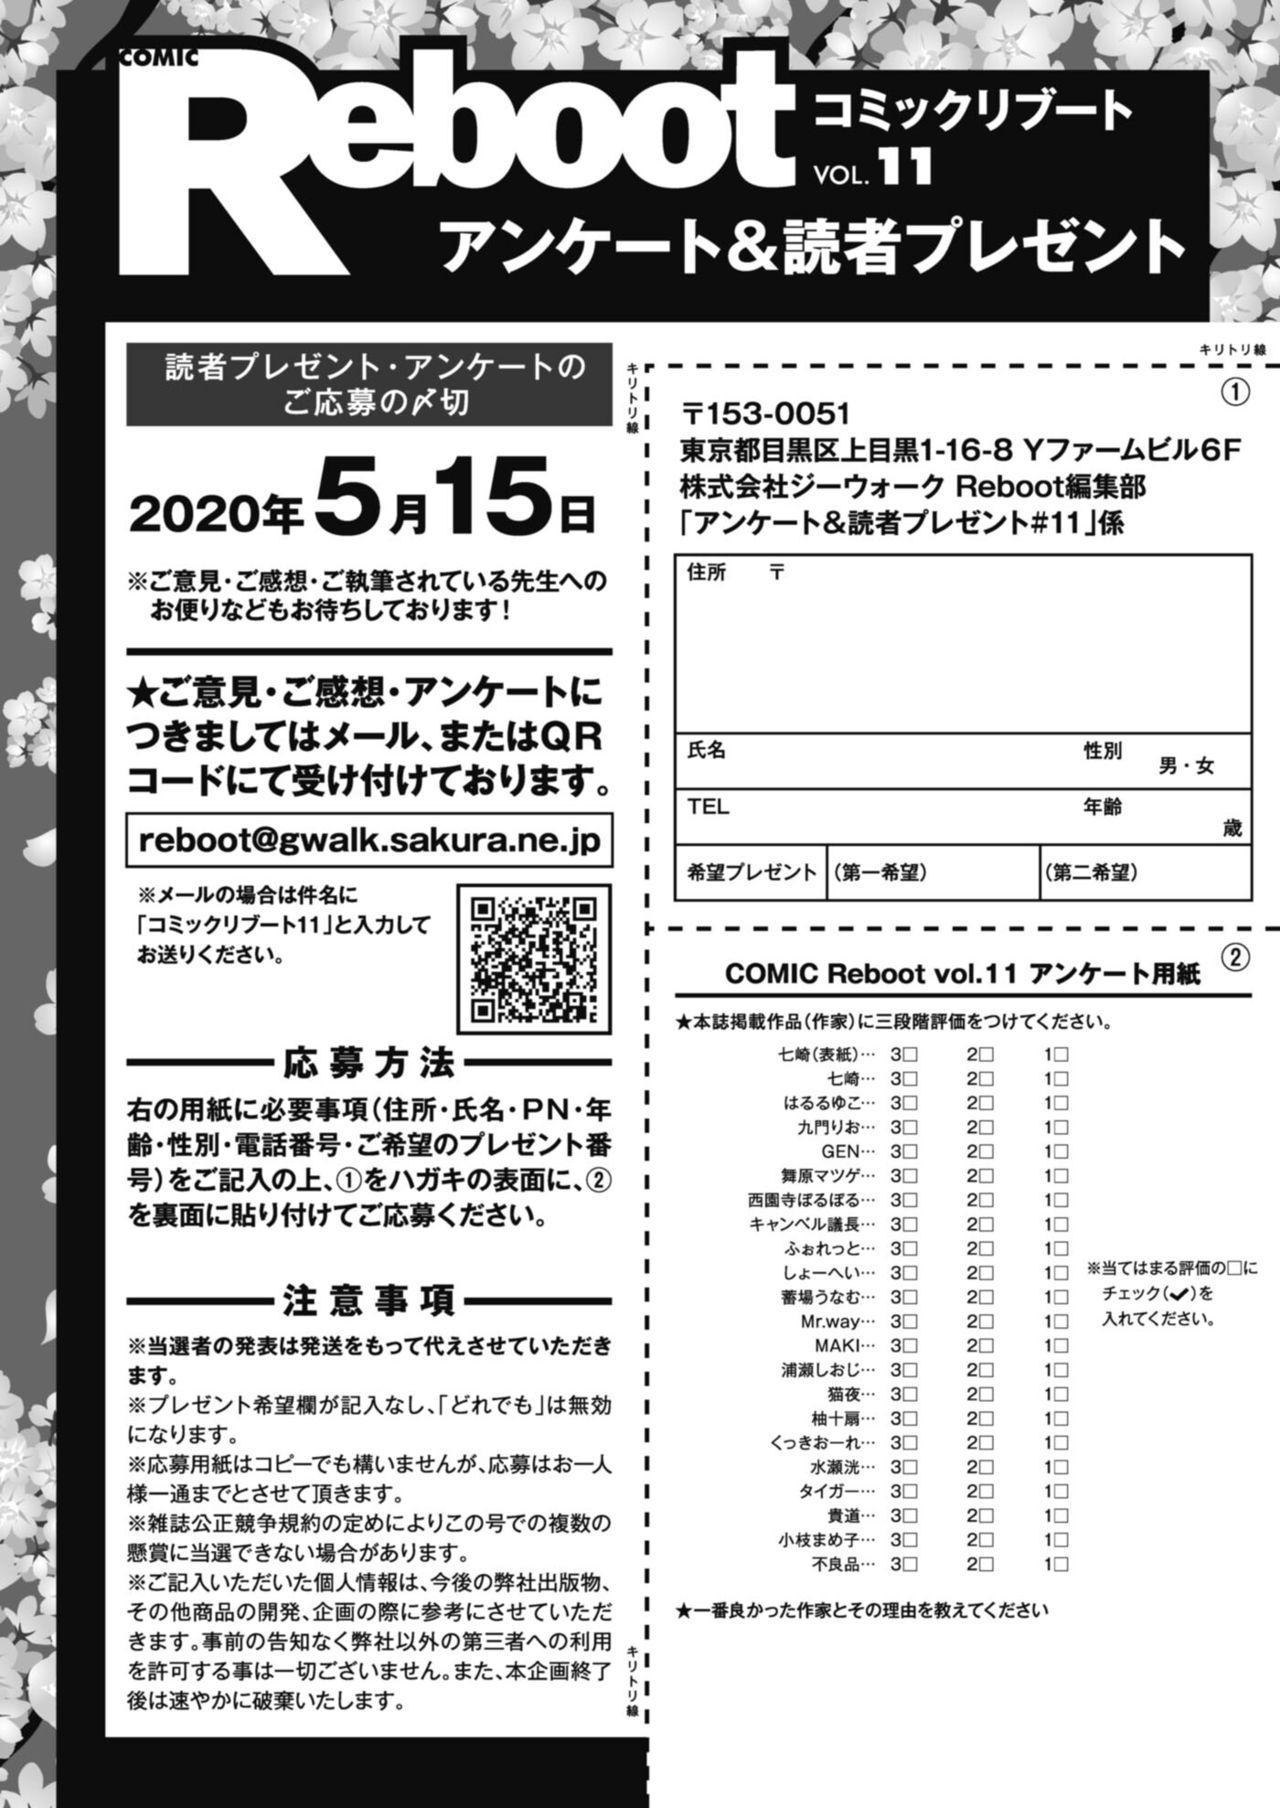 COMIC Reboot Vol. 11 515